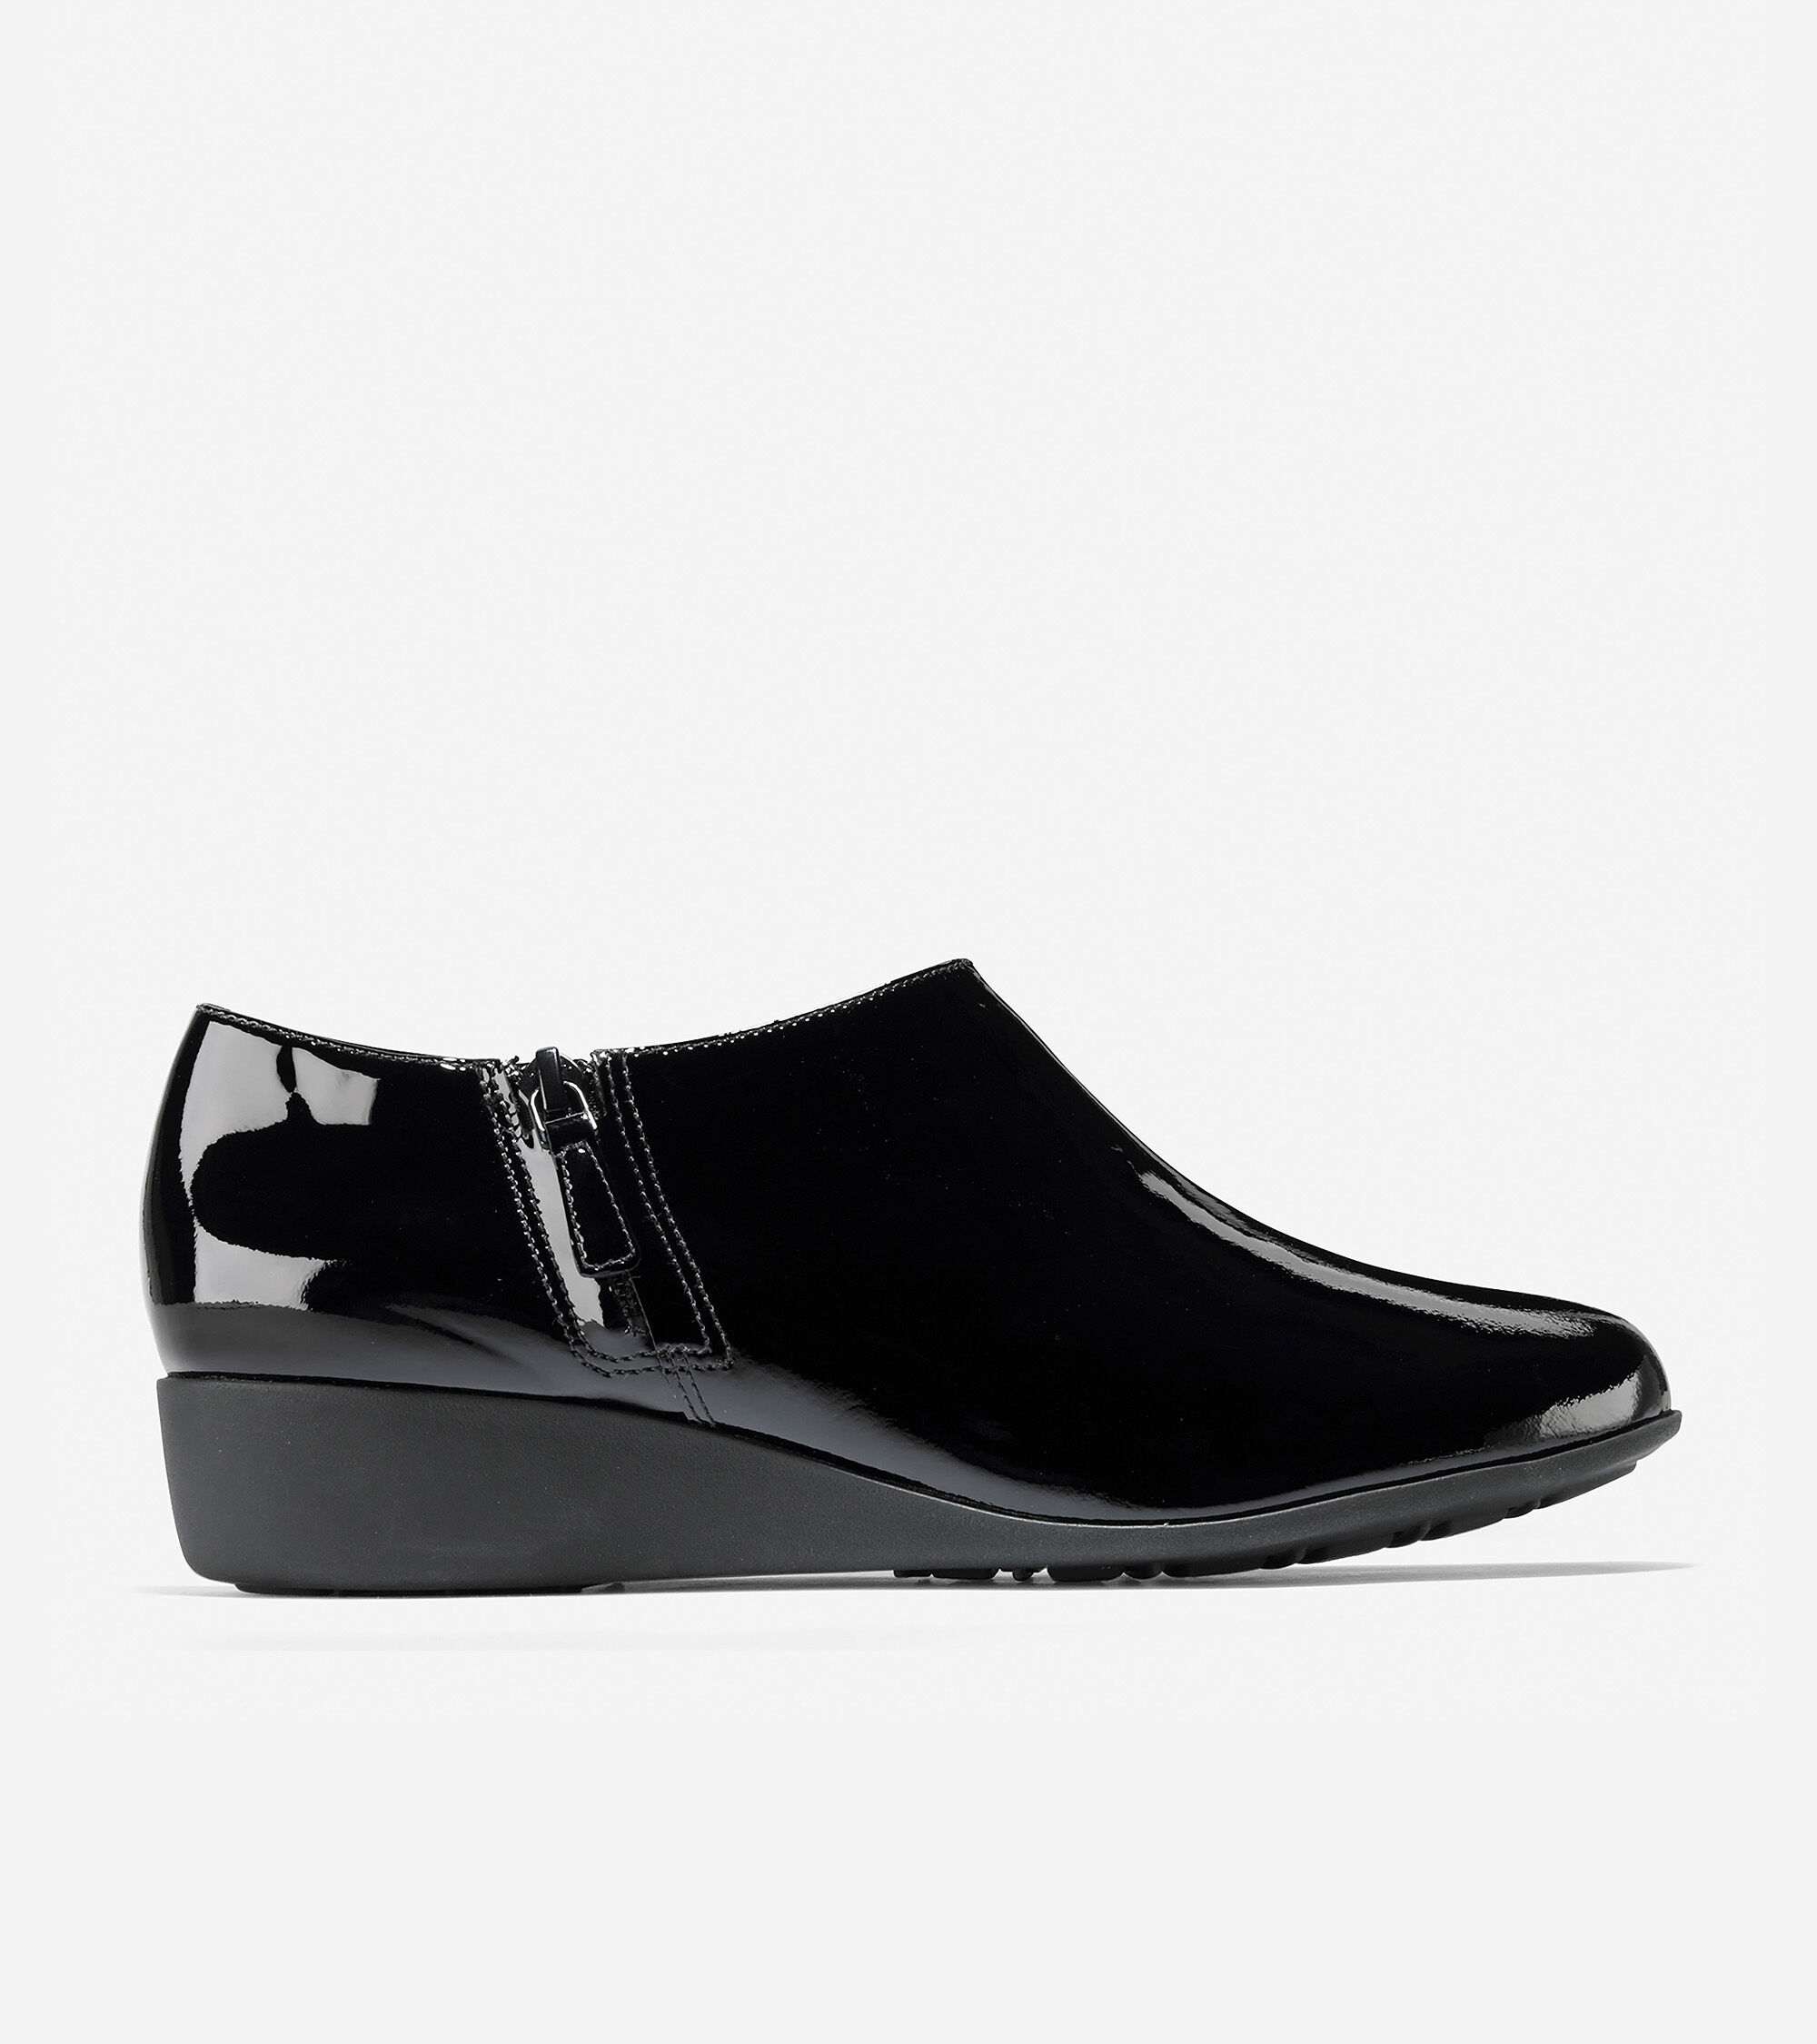 Cole Haan Womens Callie Waterproof Rain Shoe